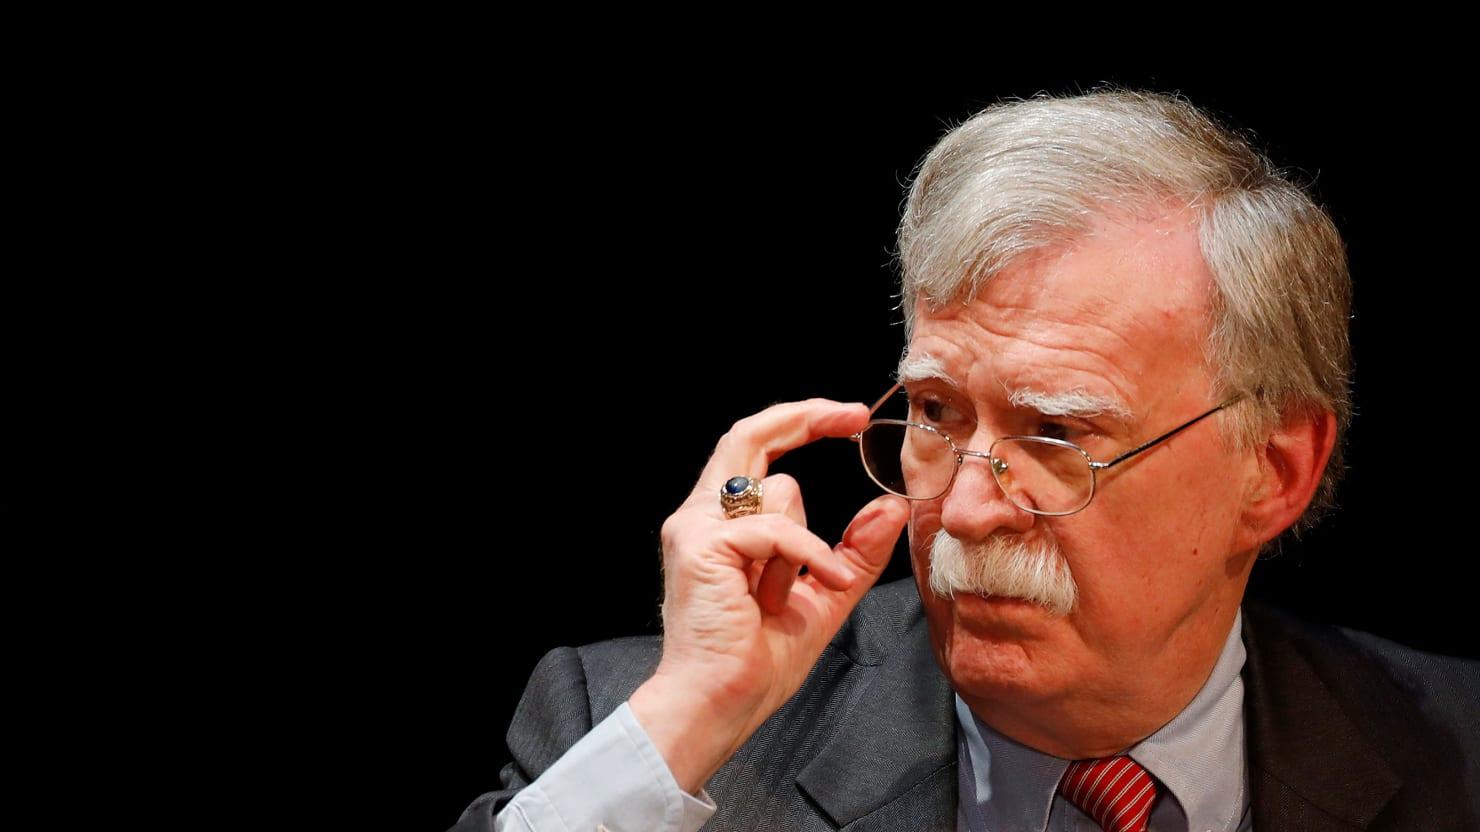 Photo of White House: 'Treasonous' John Bolton Has 'Betrayed his Country' | The Daily Beast